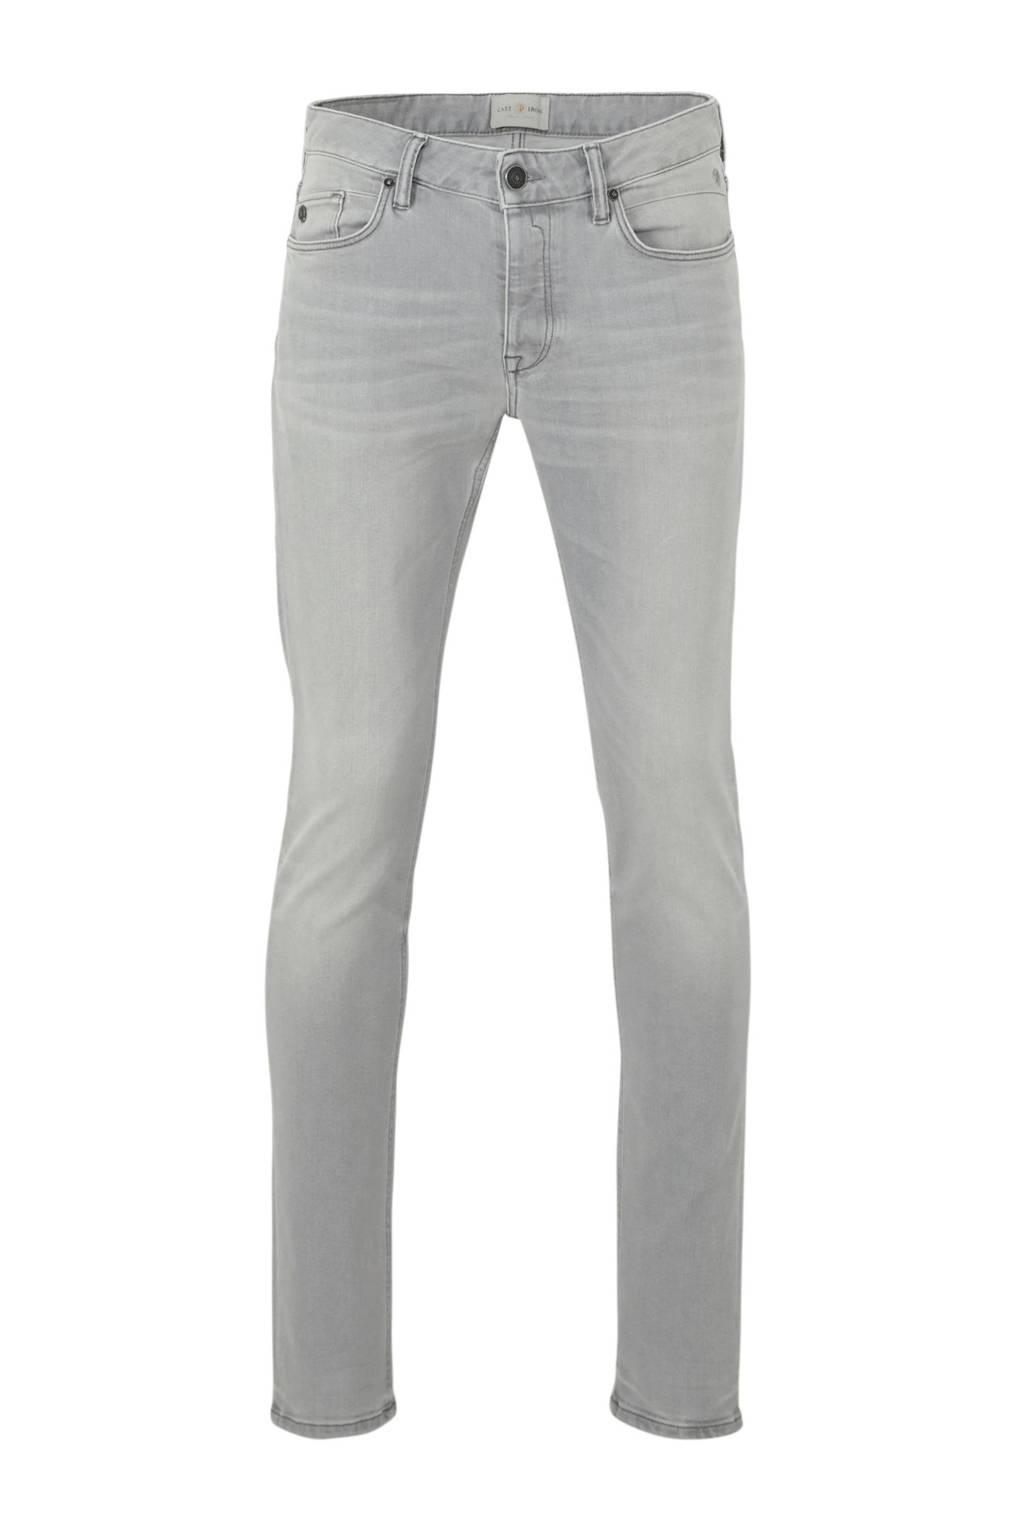 Cast Iron slim fit jeans Riser grey denim, Grey denim